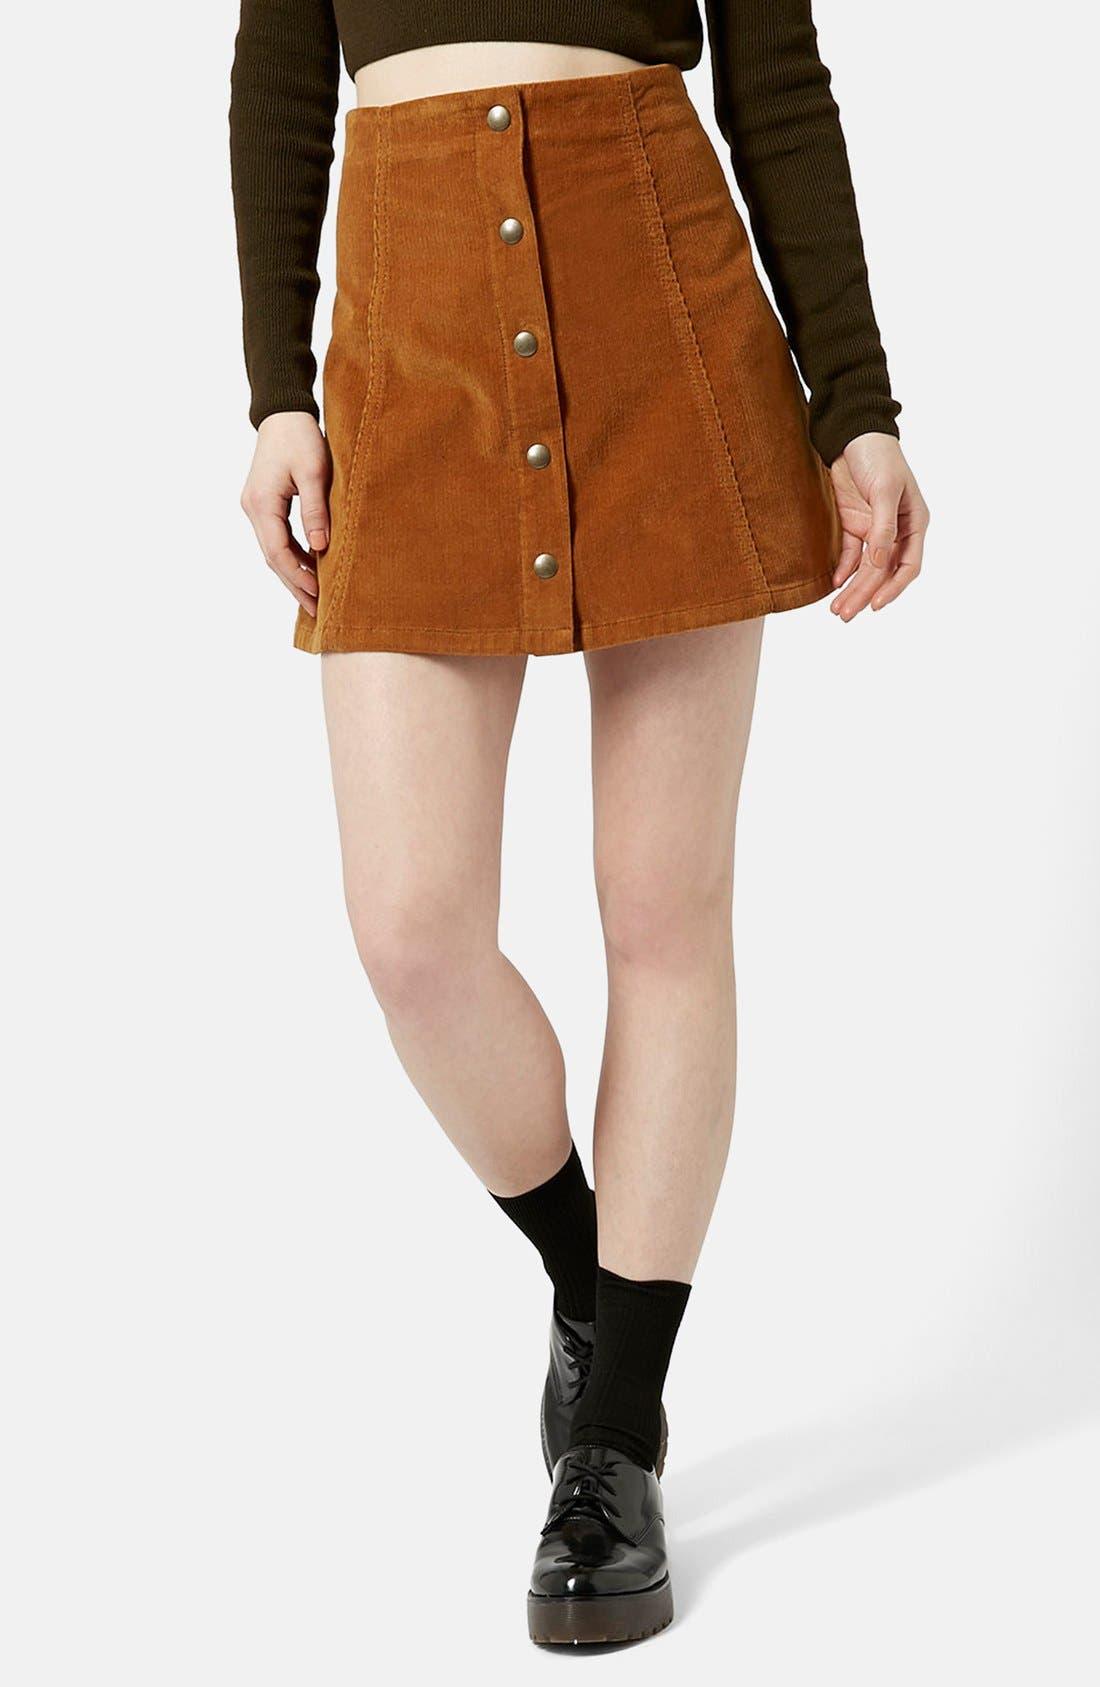 TOPSHOP, A-Line Corduroy Skirt, Main thumbnail 1, color, 210